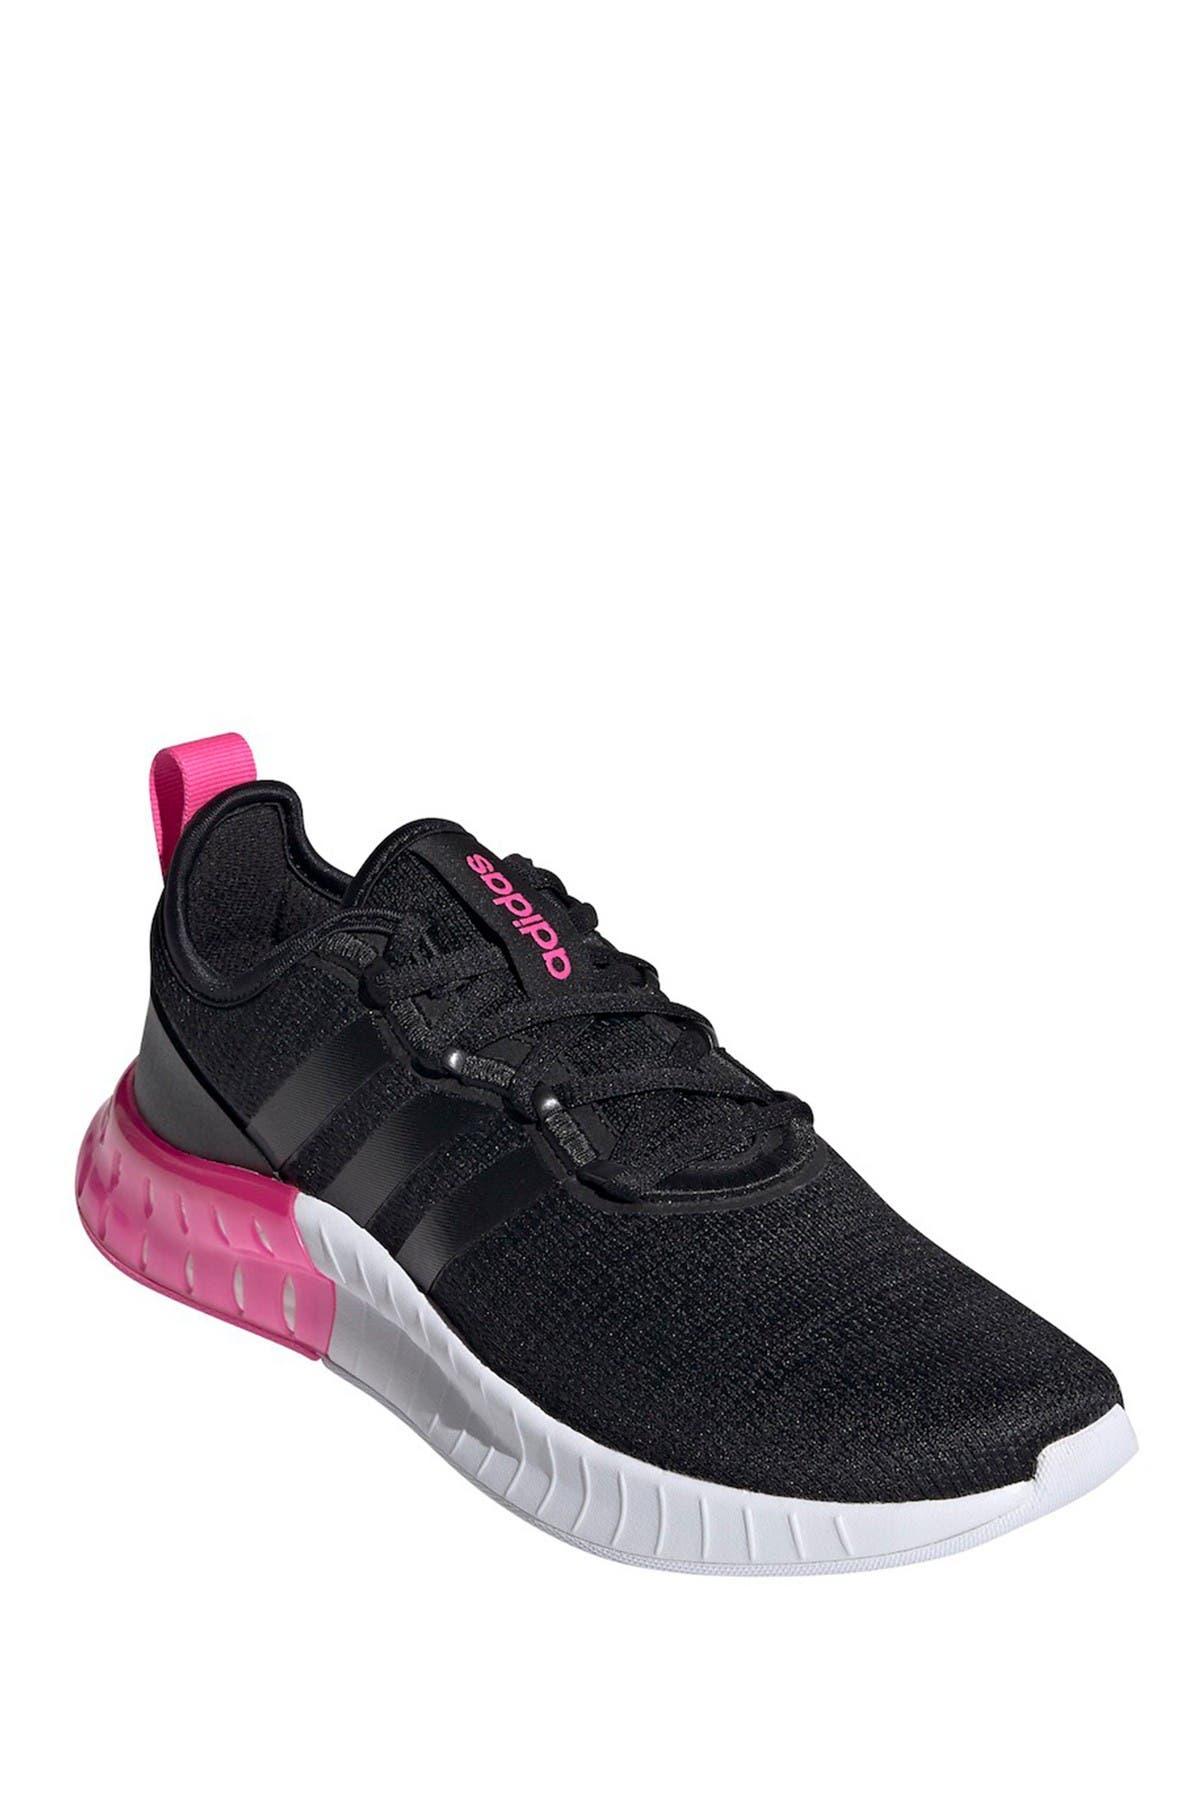 Image of adidas Kaptir Super Sneaker